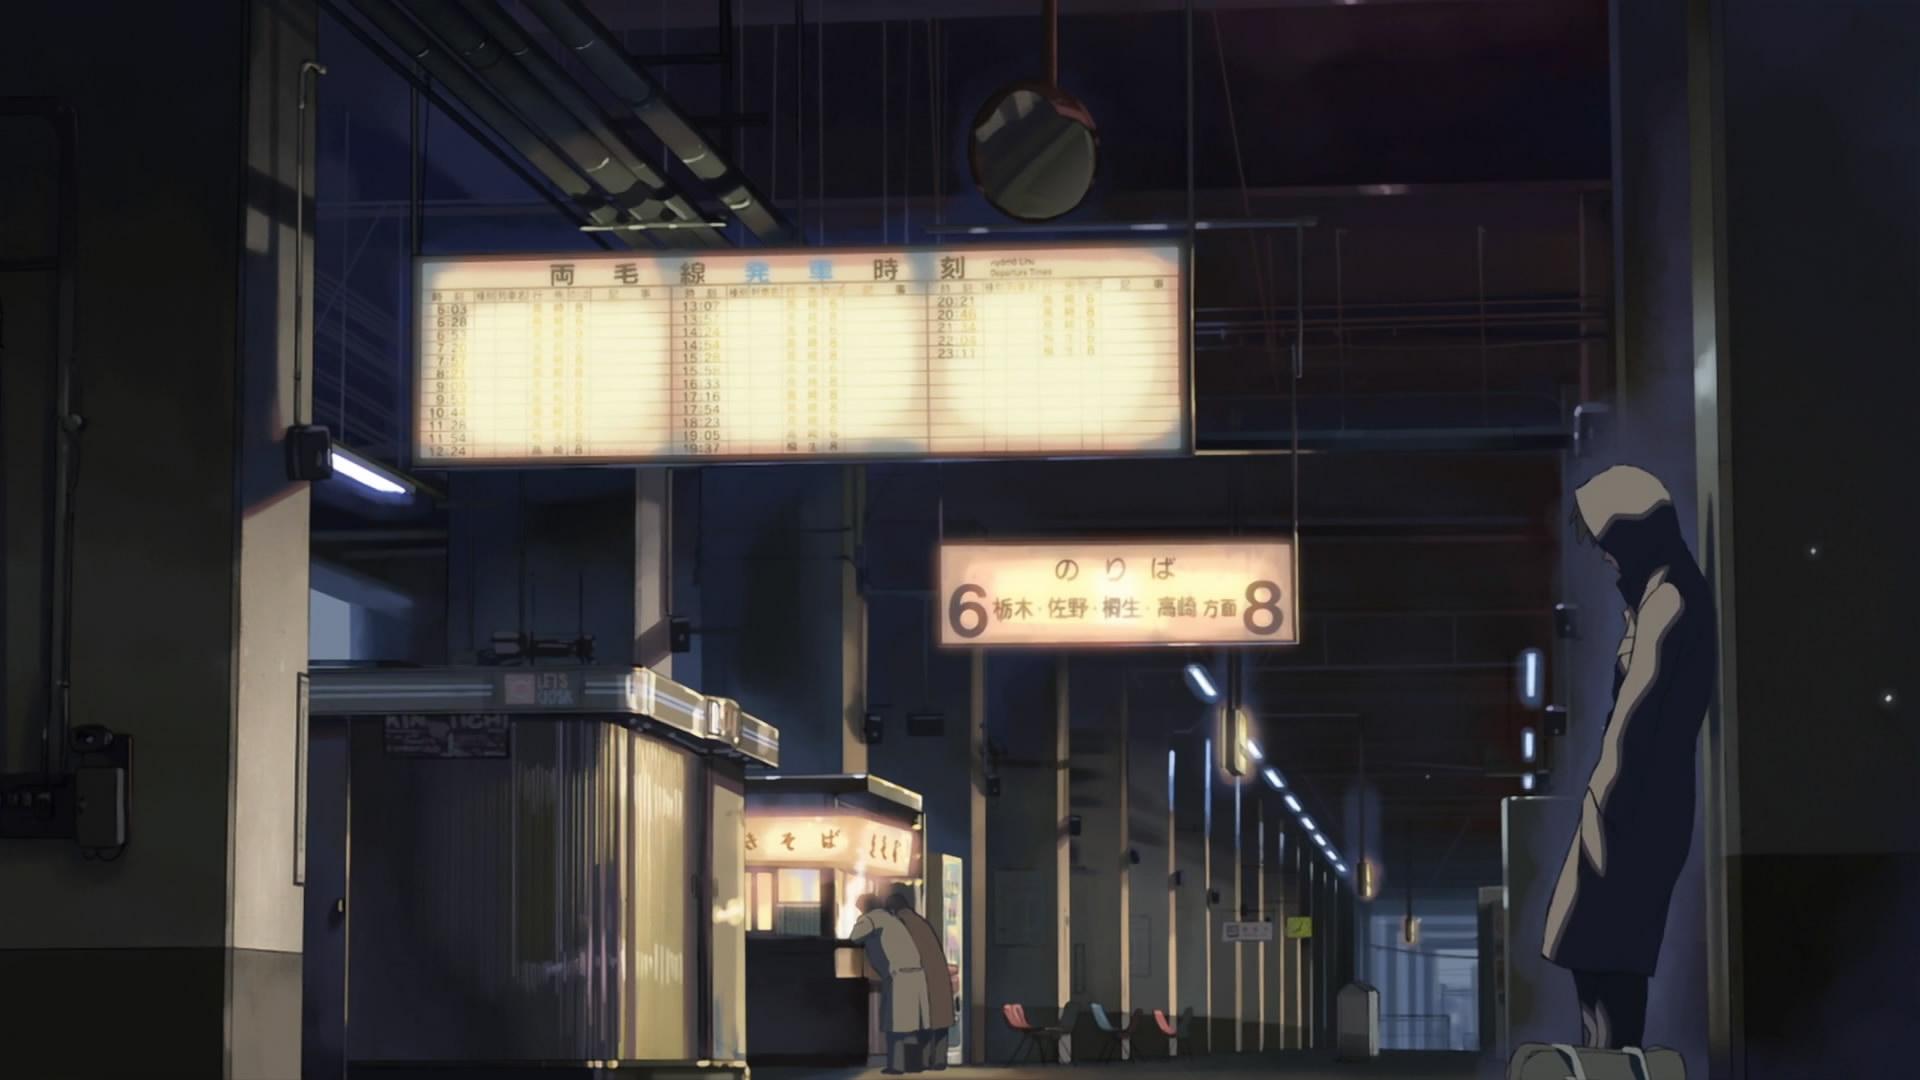 Makoto Shinkai Train Stations Lonely 5 Centimeters Per Second Free Wallpaper Wallpaperjam Com